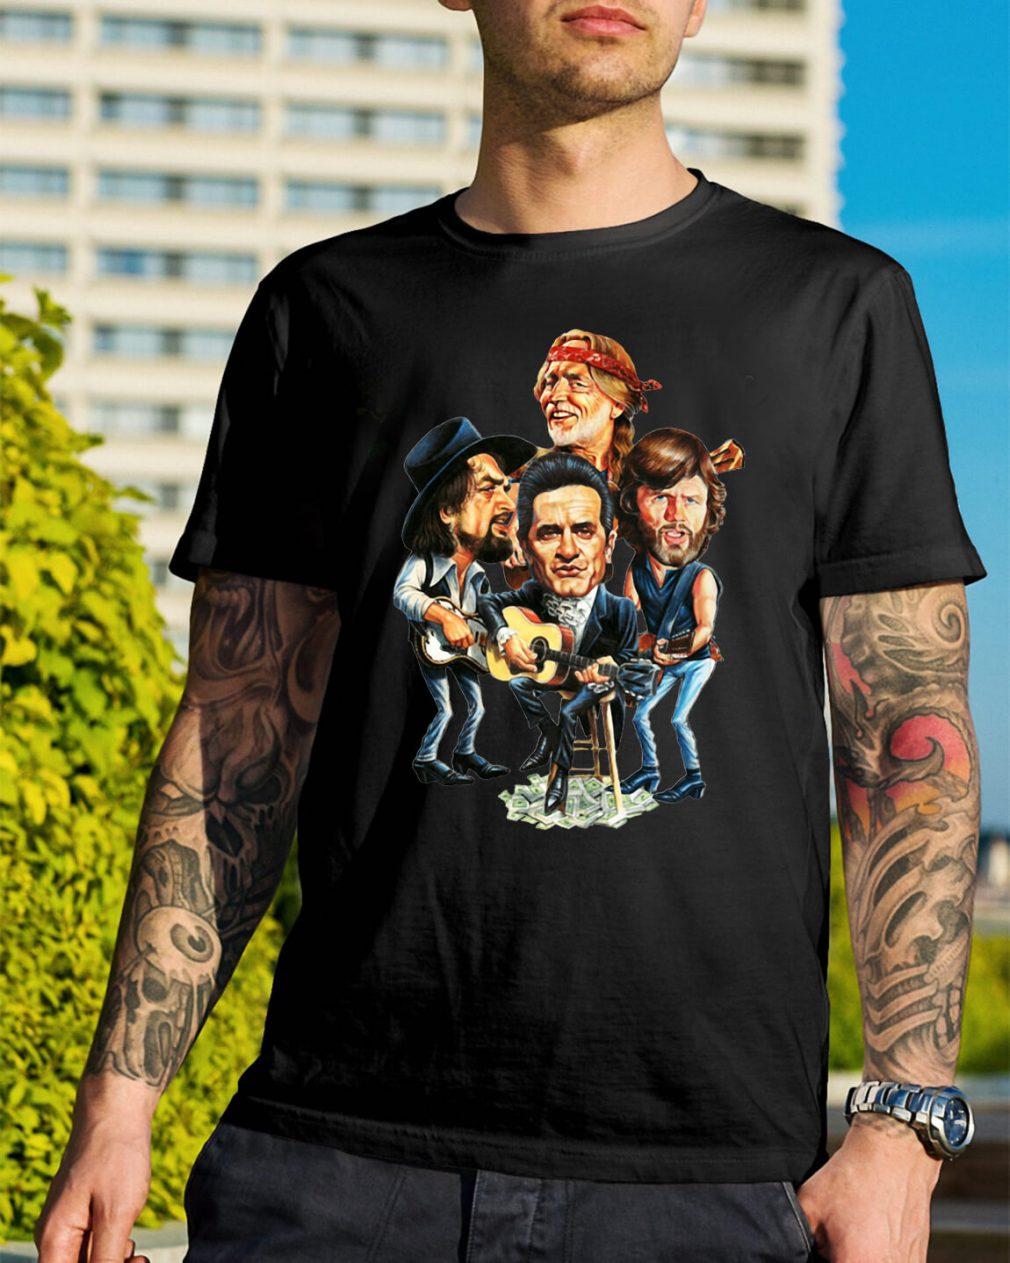 The Highwaymen group music shirt